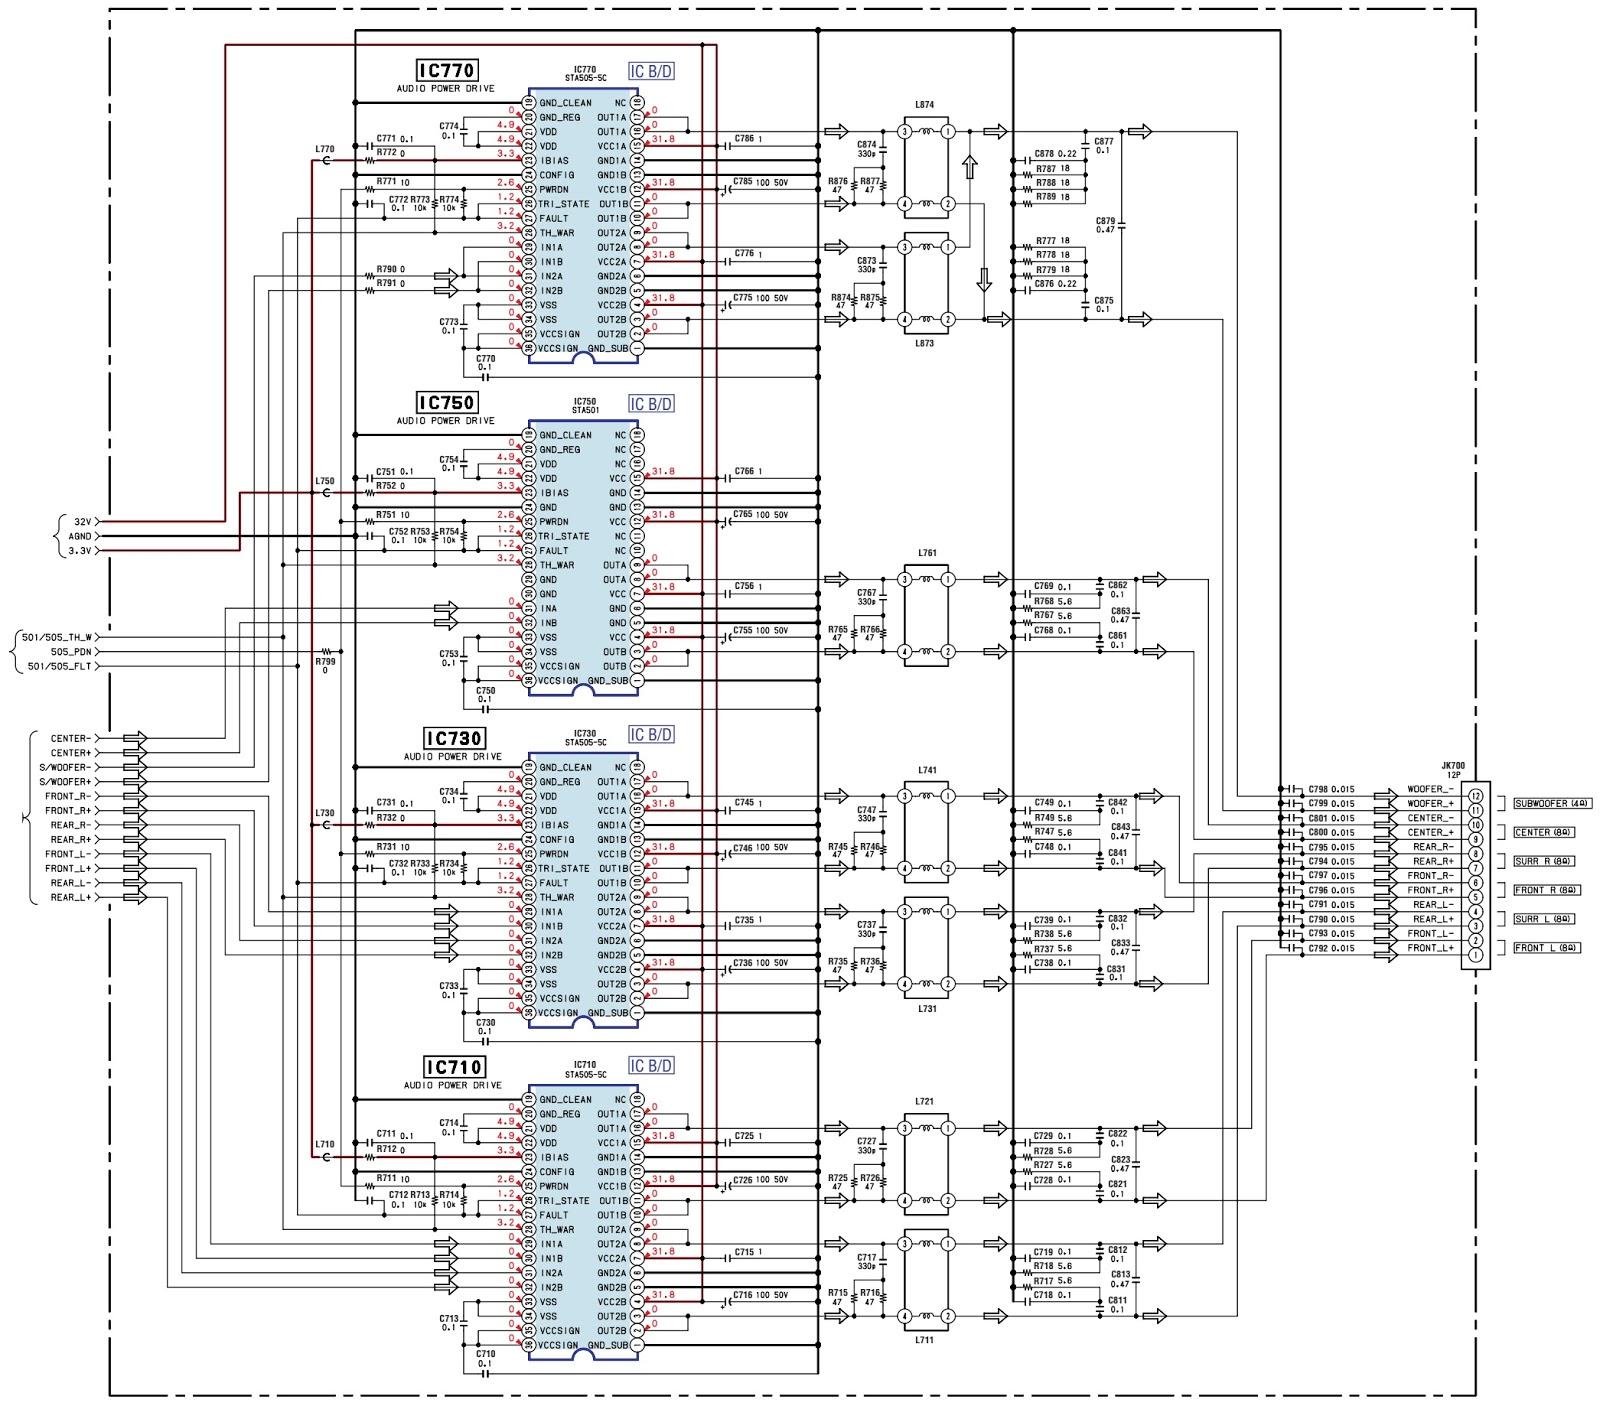 Aiwa Wiring Twin Duct - Wiring Diagram G11 on